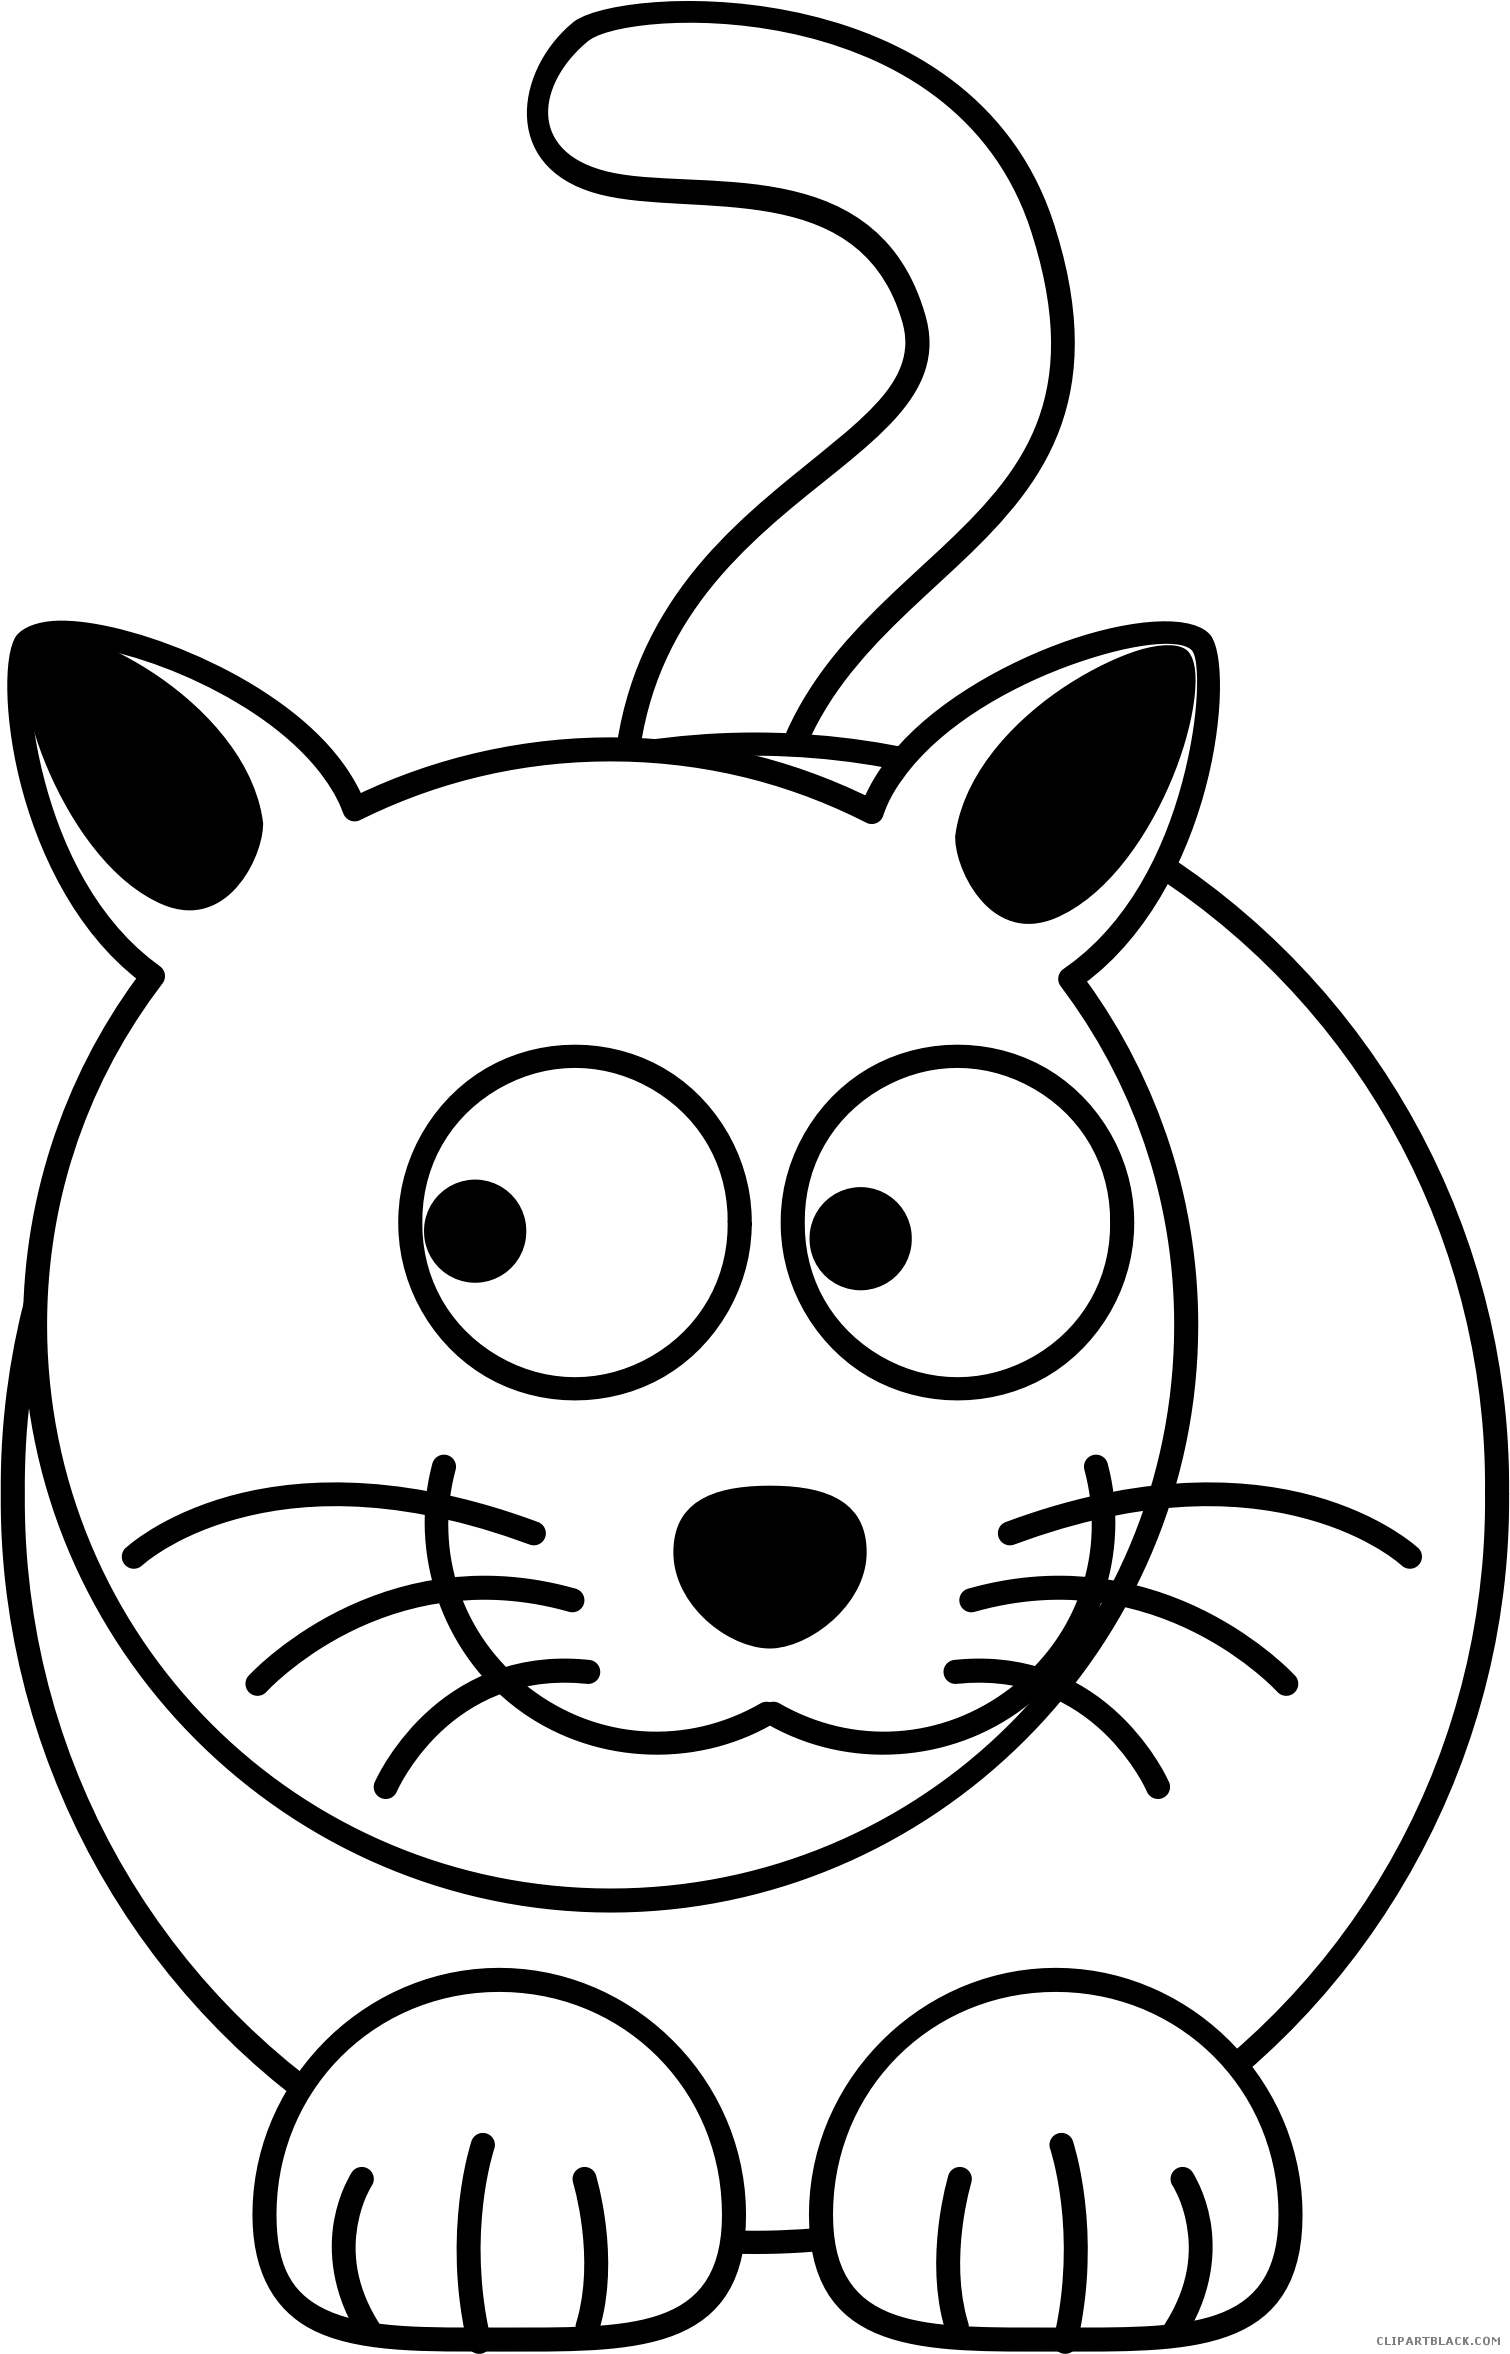 Crazy cat lady clipart jpg transparent stock Cat - Page 14 of 95 - ClipartBlack.com jpg transparent stock